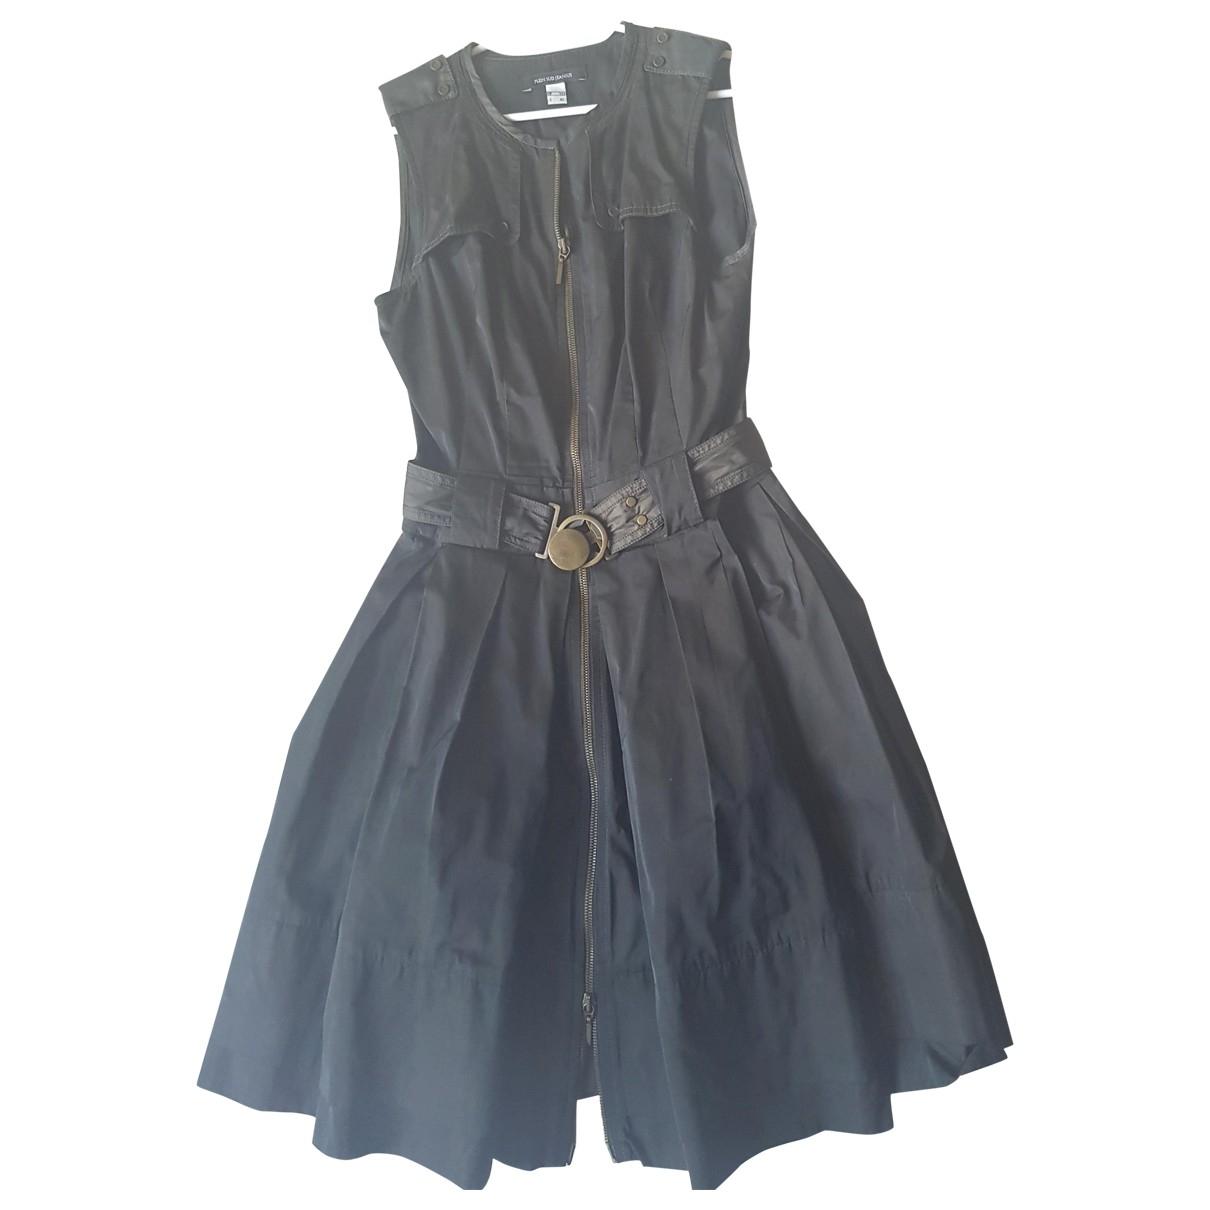 Plein Sud \N Kleid in  Khaki Polyester